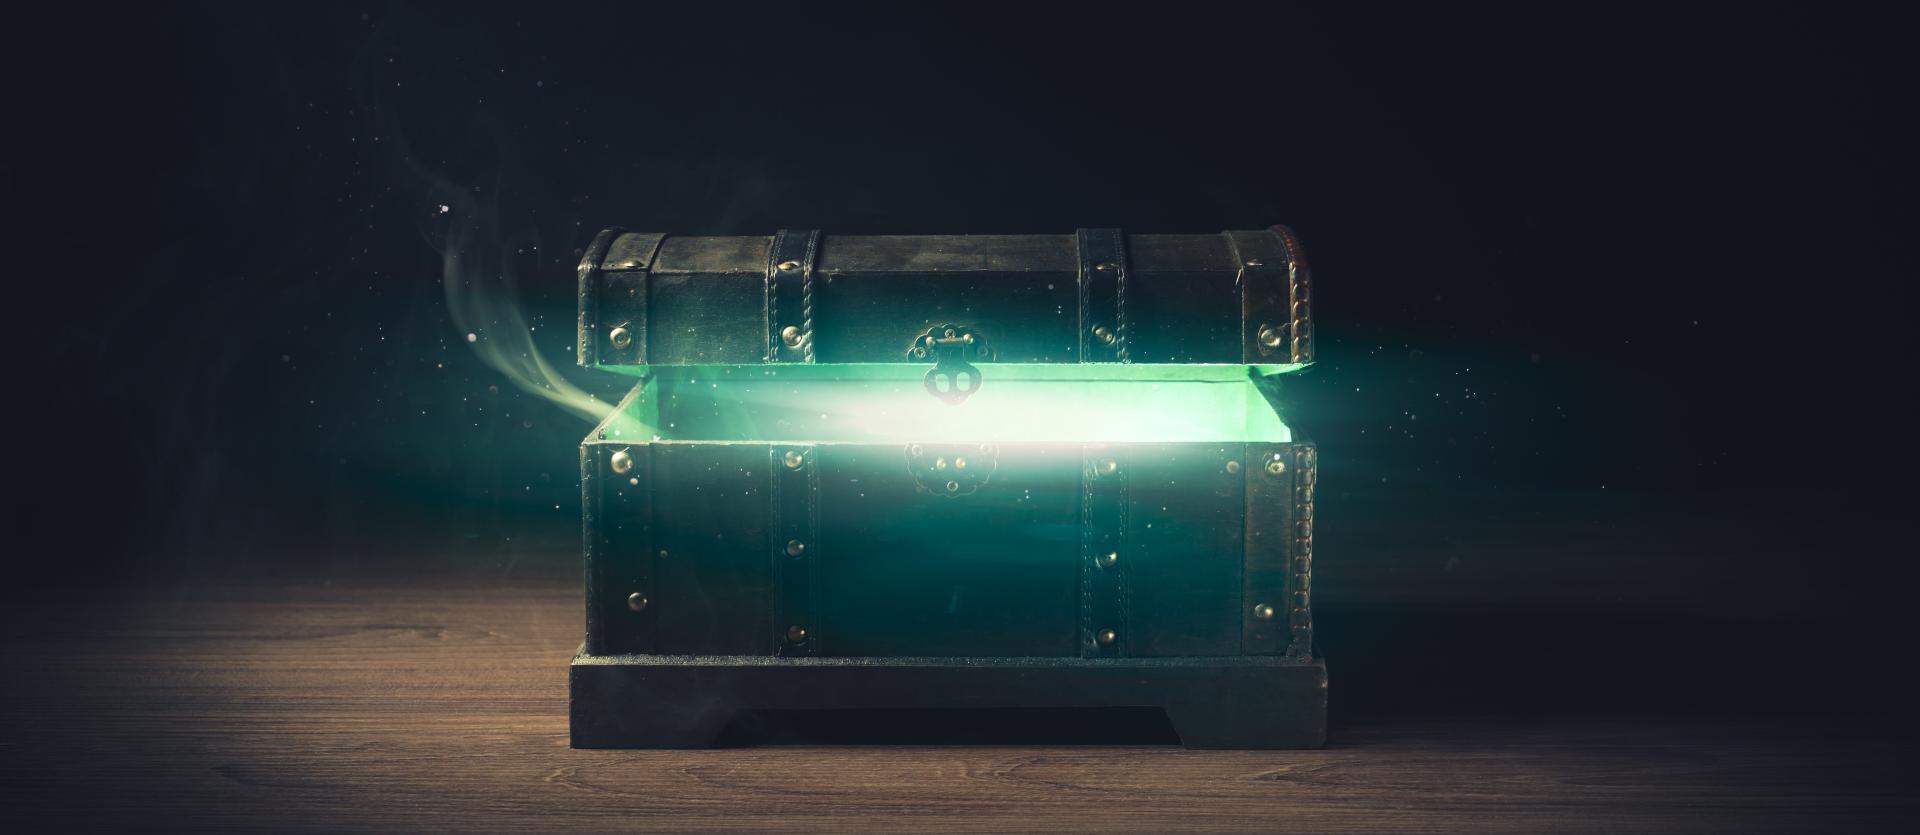 pandoras-box-mini.png